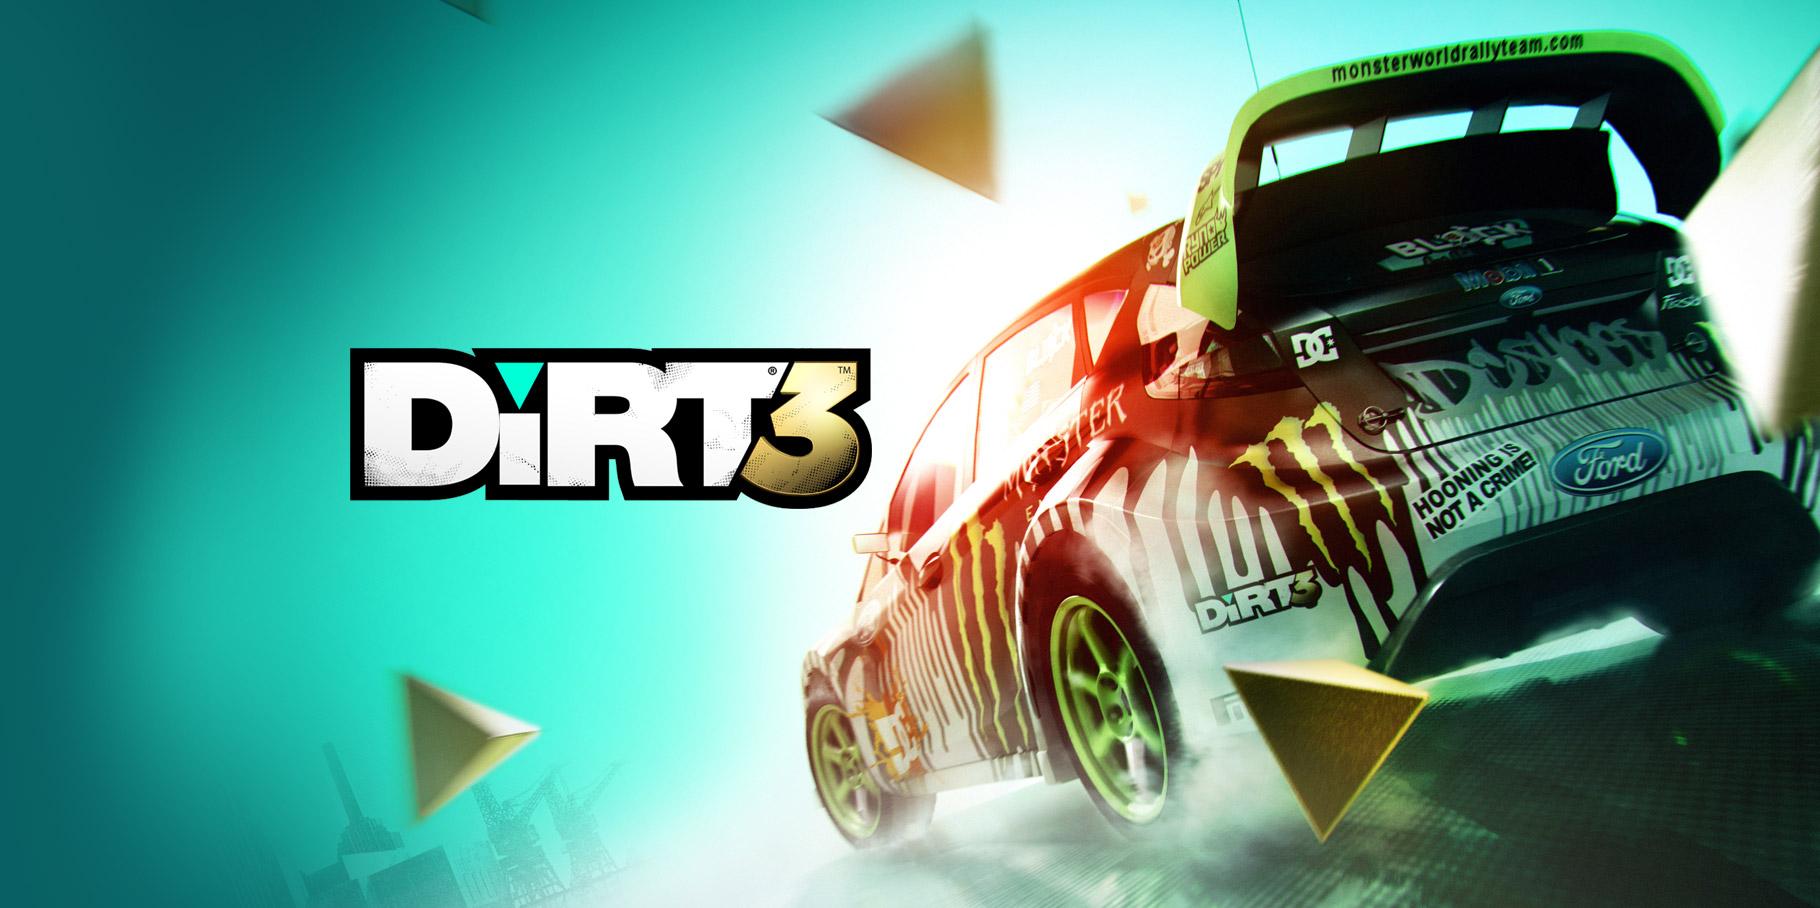 Dirt 3 PC Download